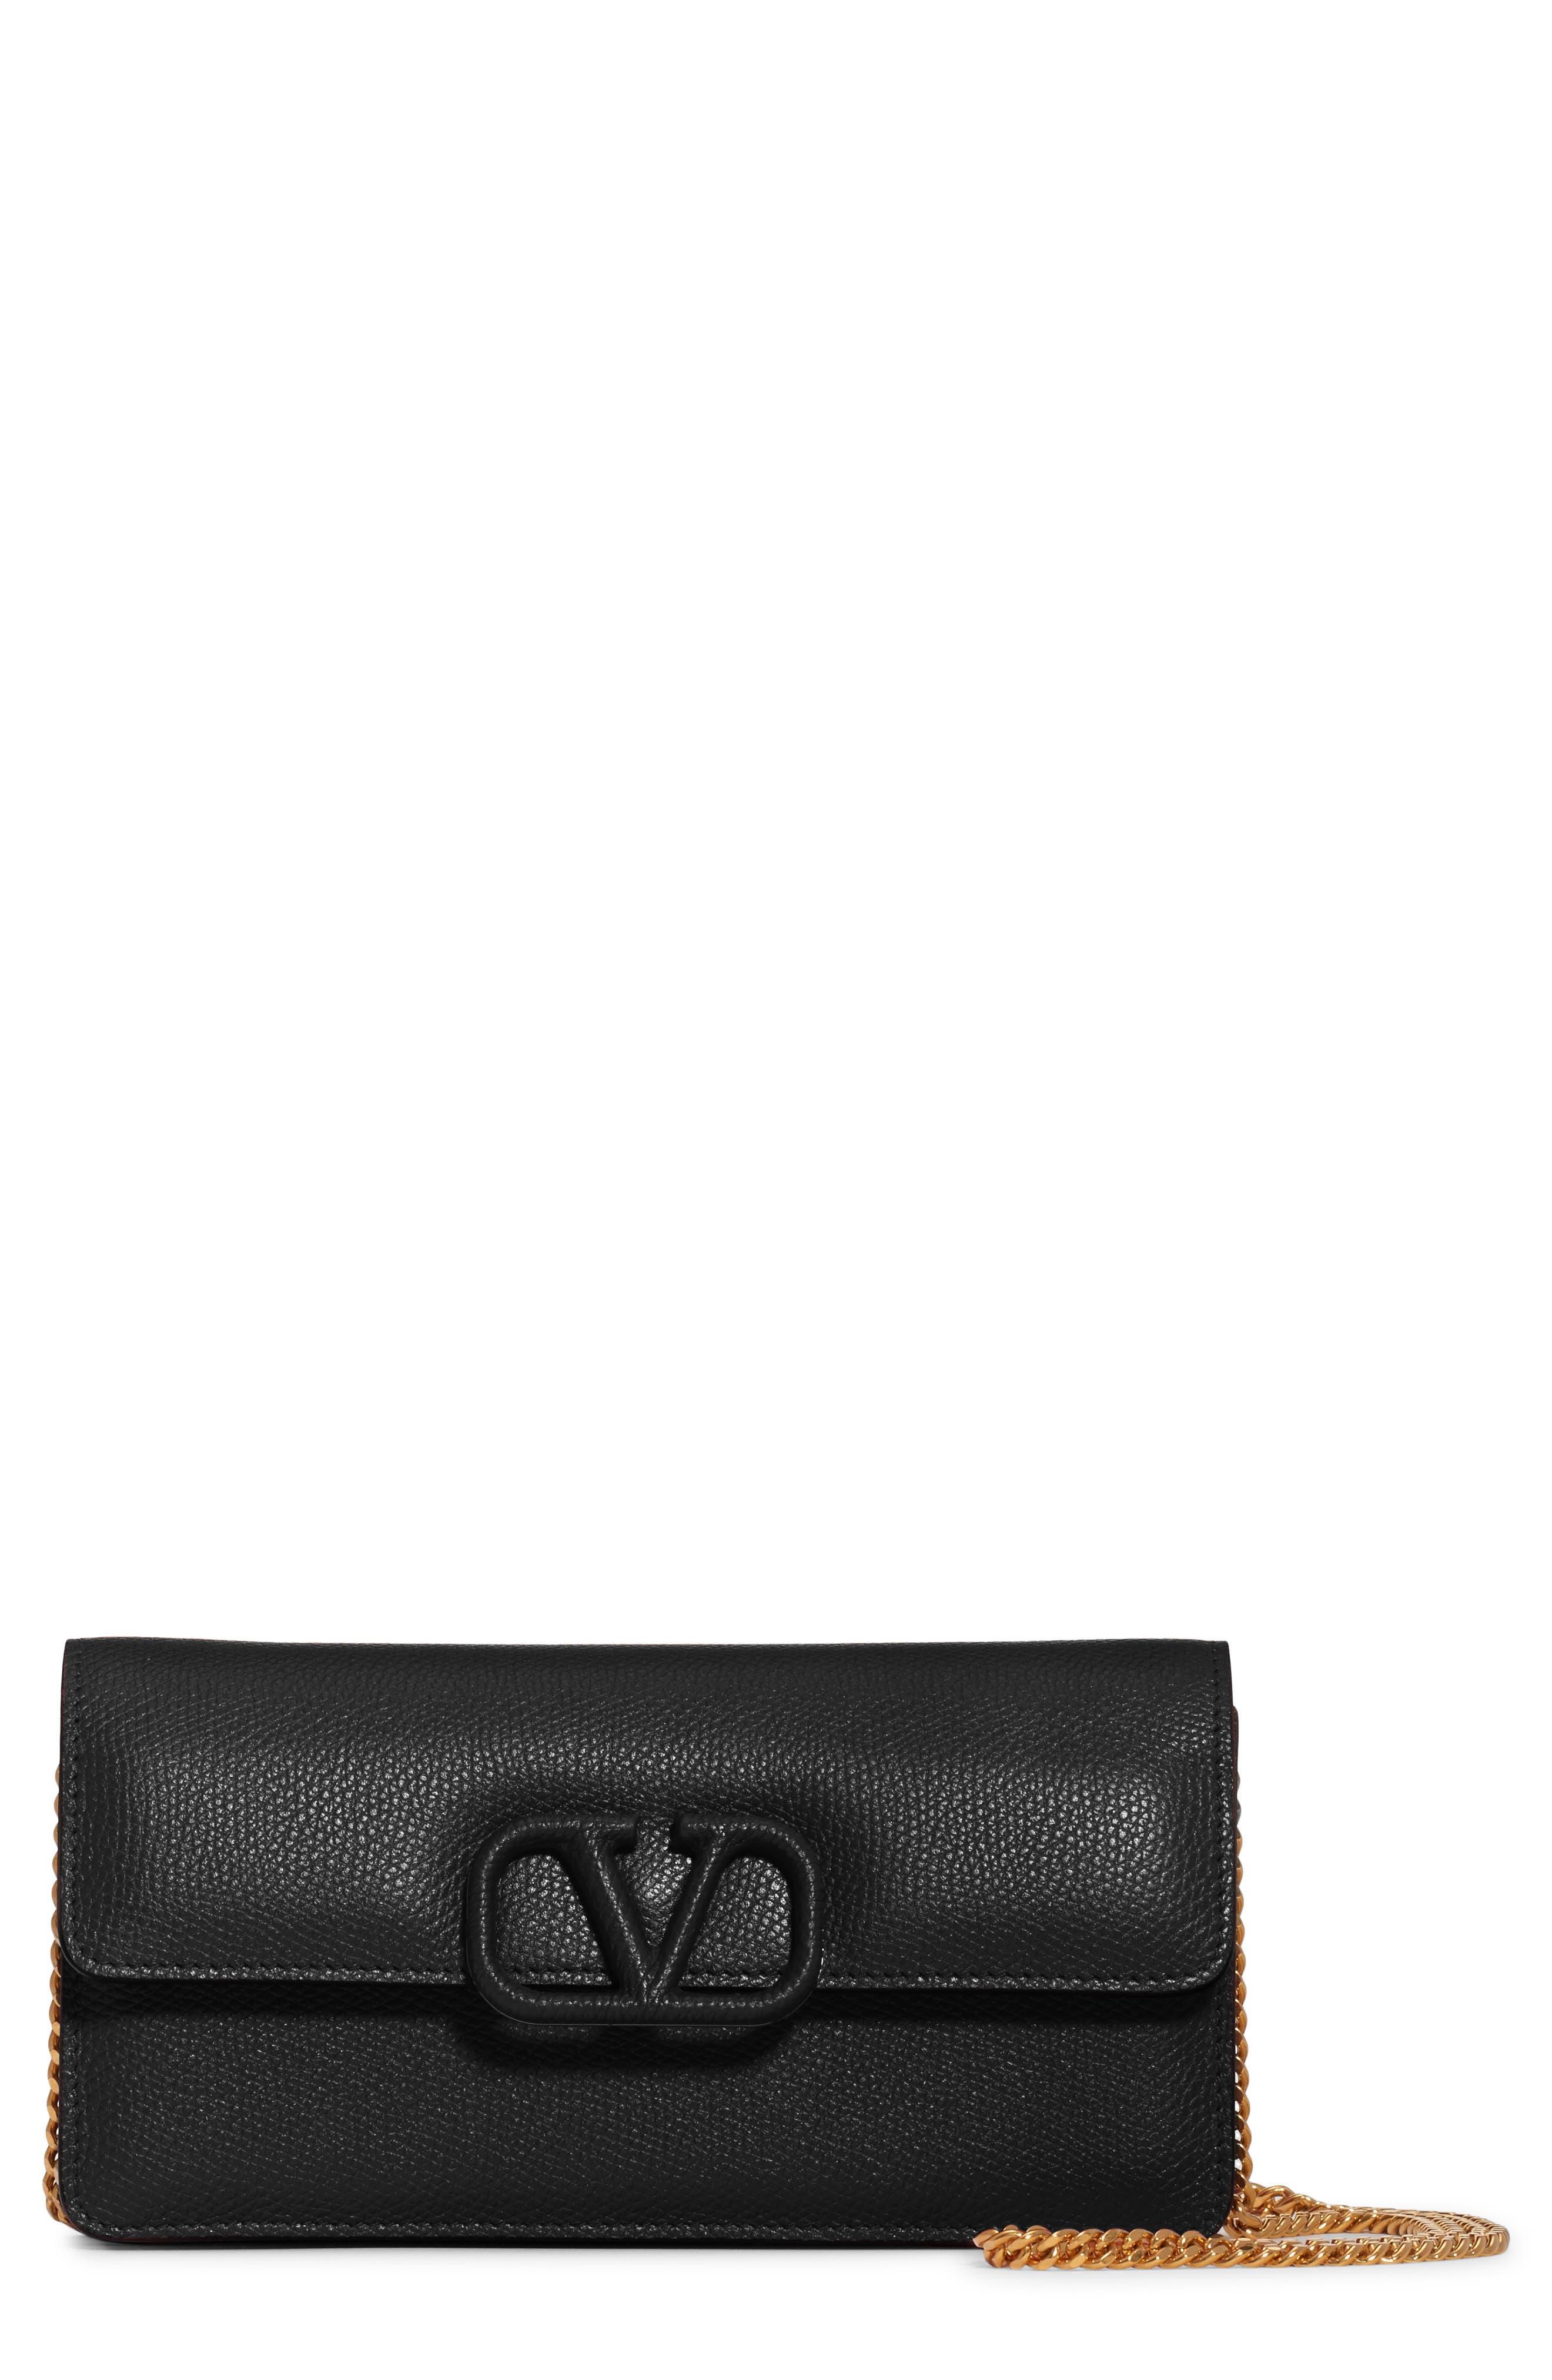 Valentino Garavani VSling Calfskin Wallet on a Chain | Nordstrom